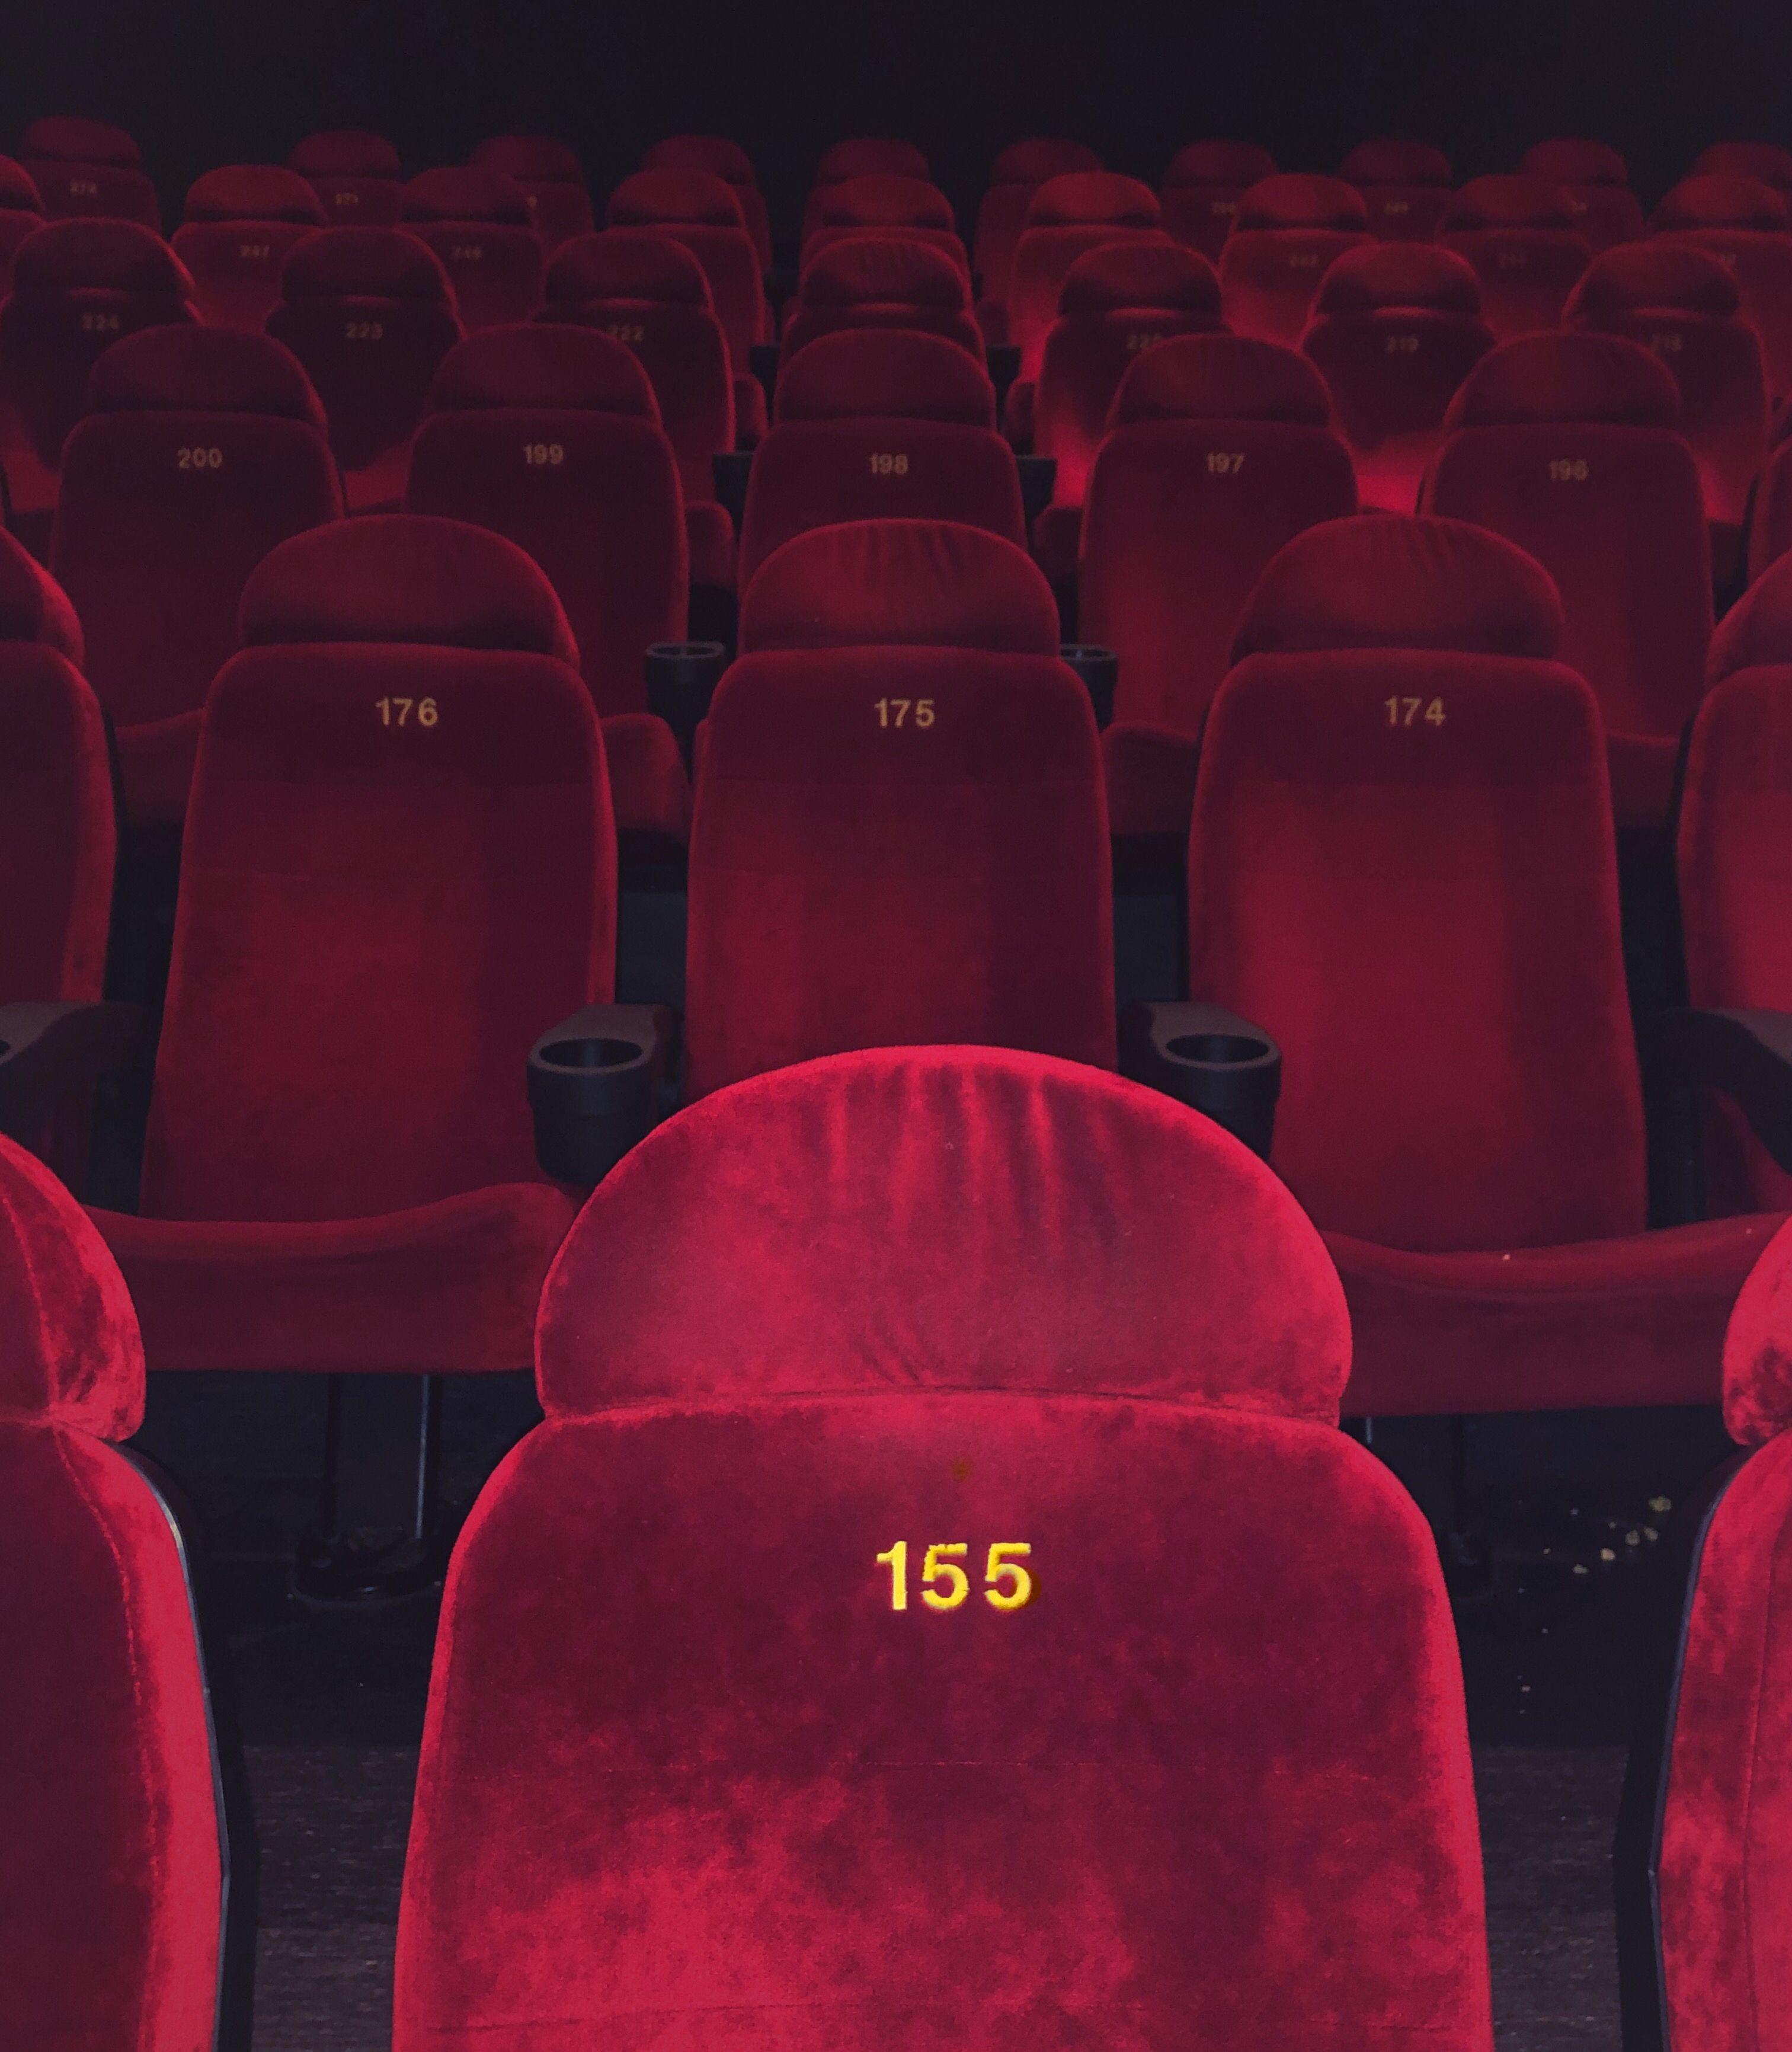 Cinema Cinema Red Aesthetic Aesthetic